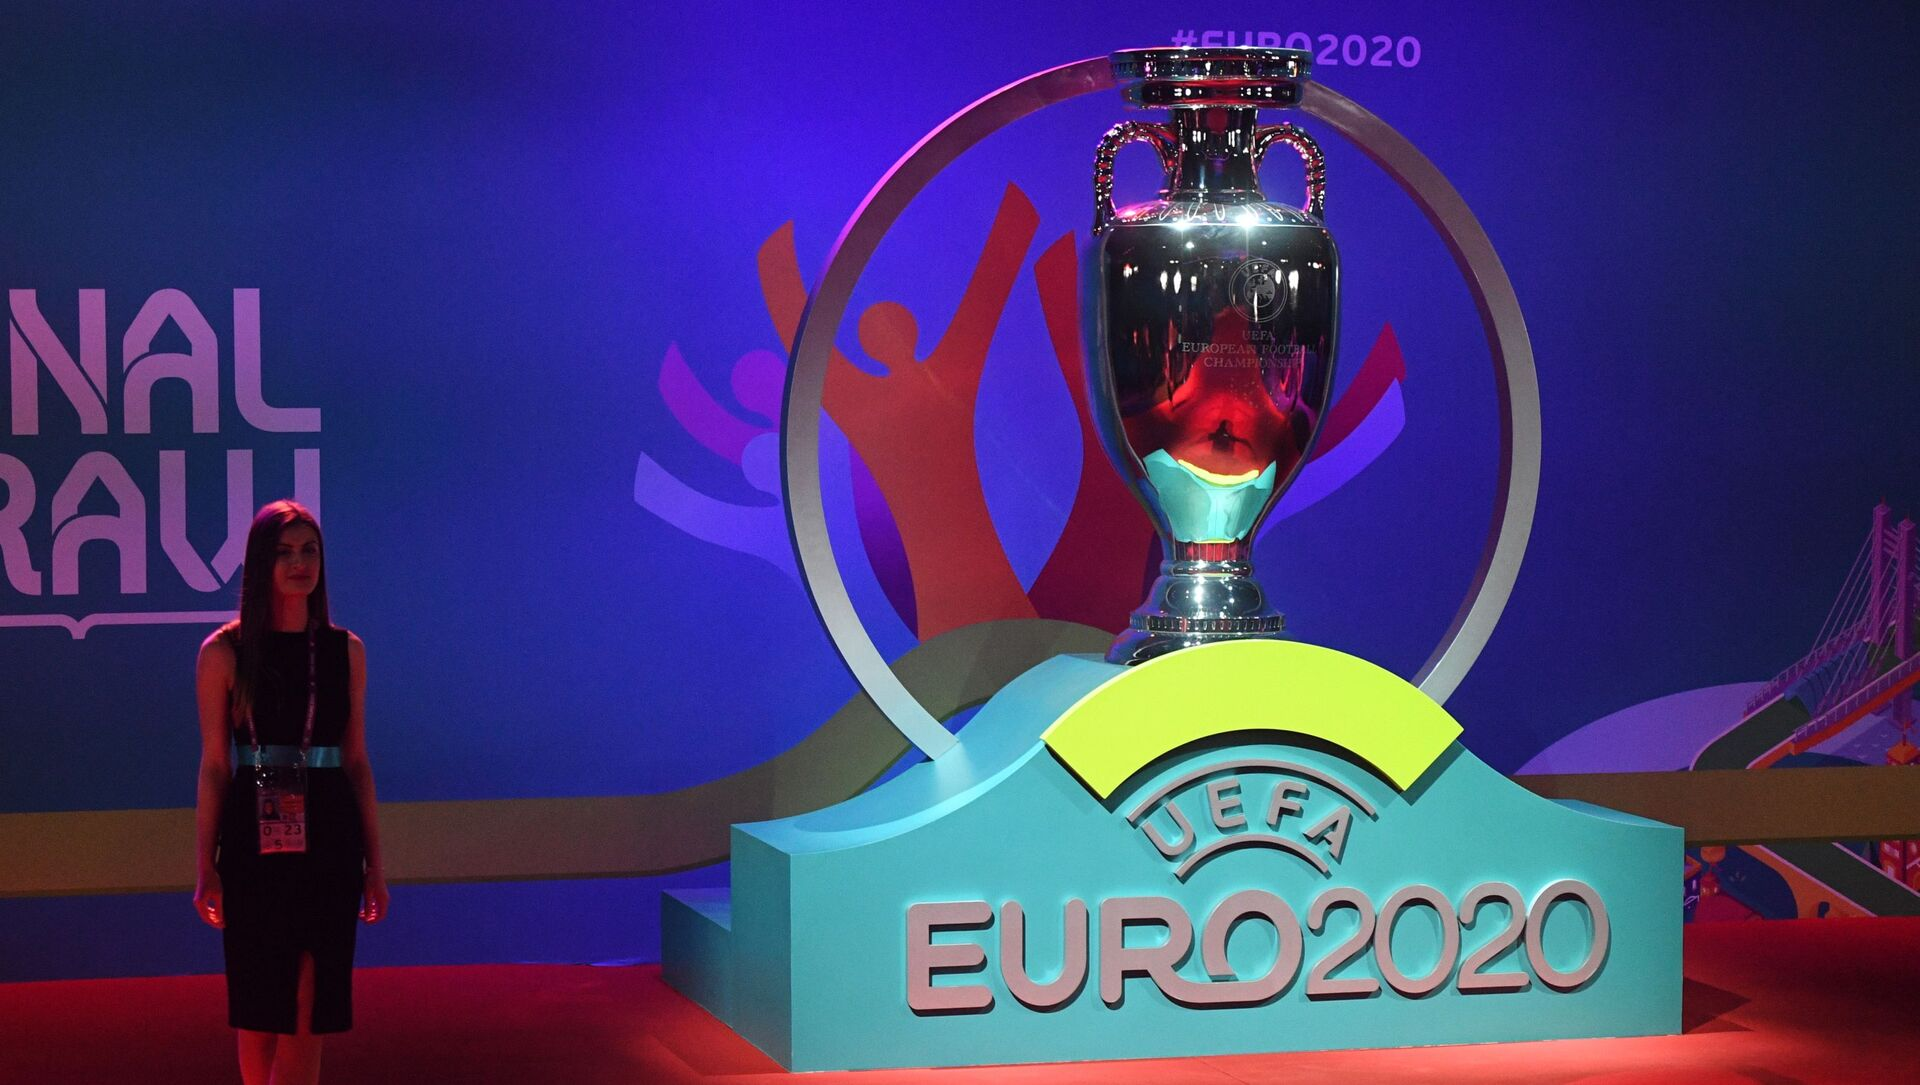 Кубок чемпионата Европы по футболу 2020 года - Sputnik Азербайджан, 1920, 14.04.2021